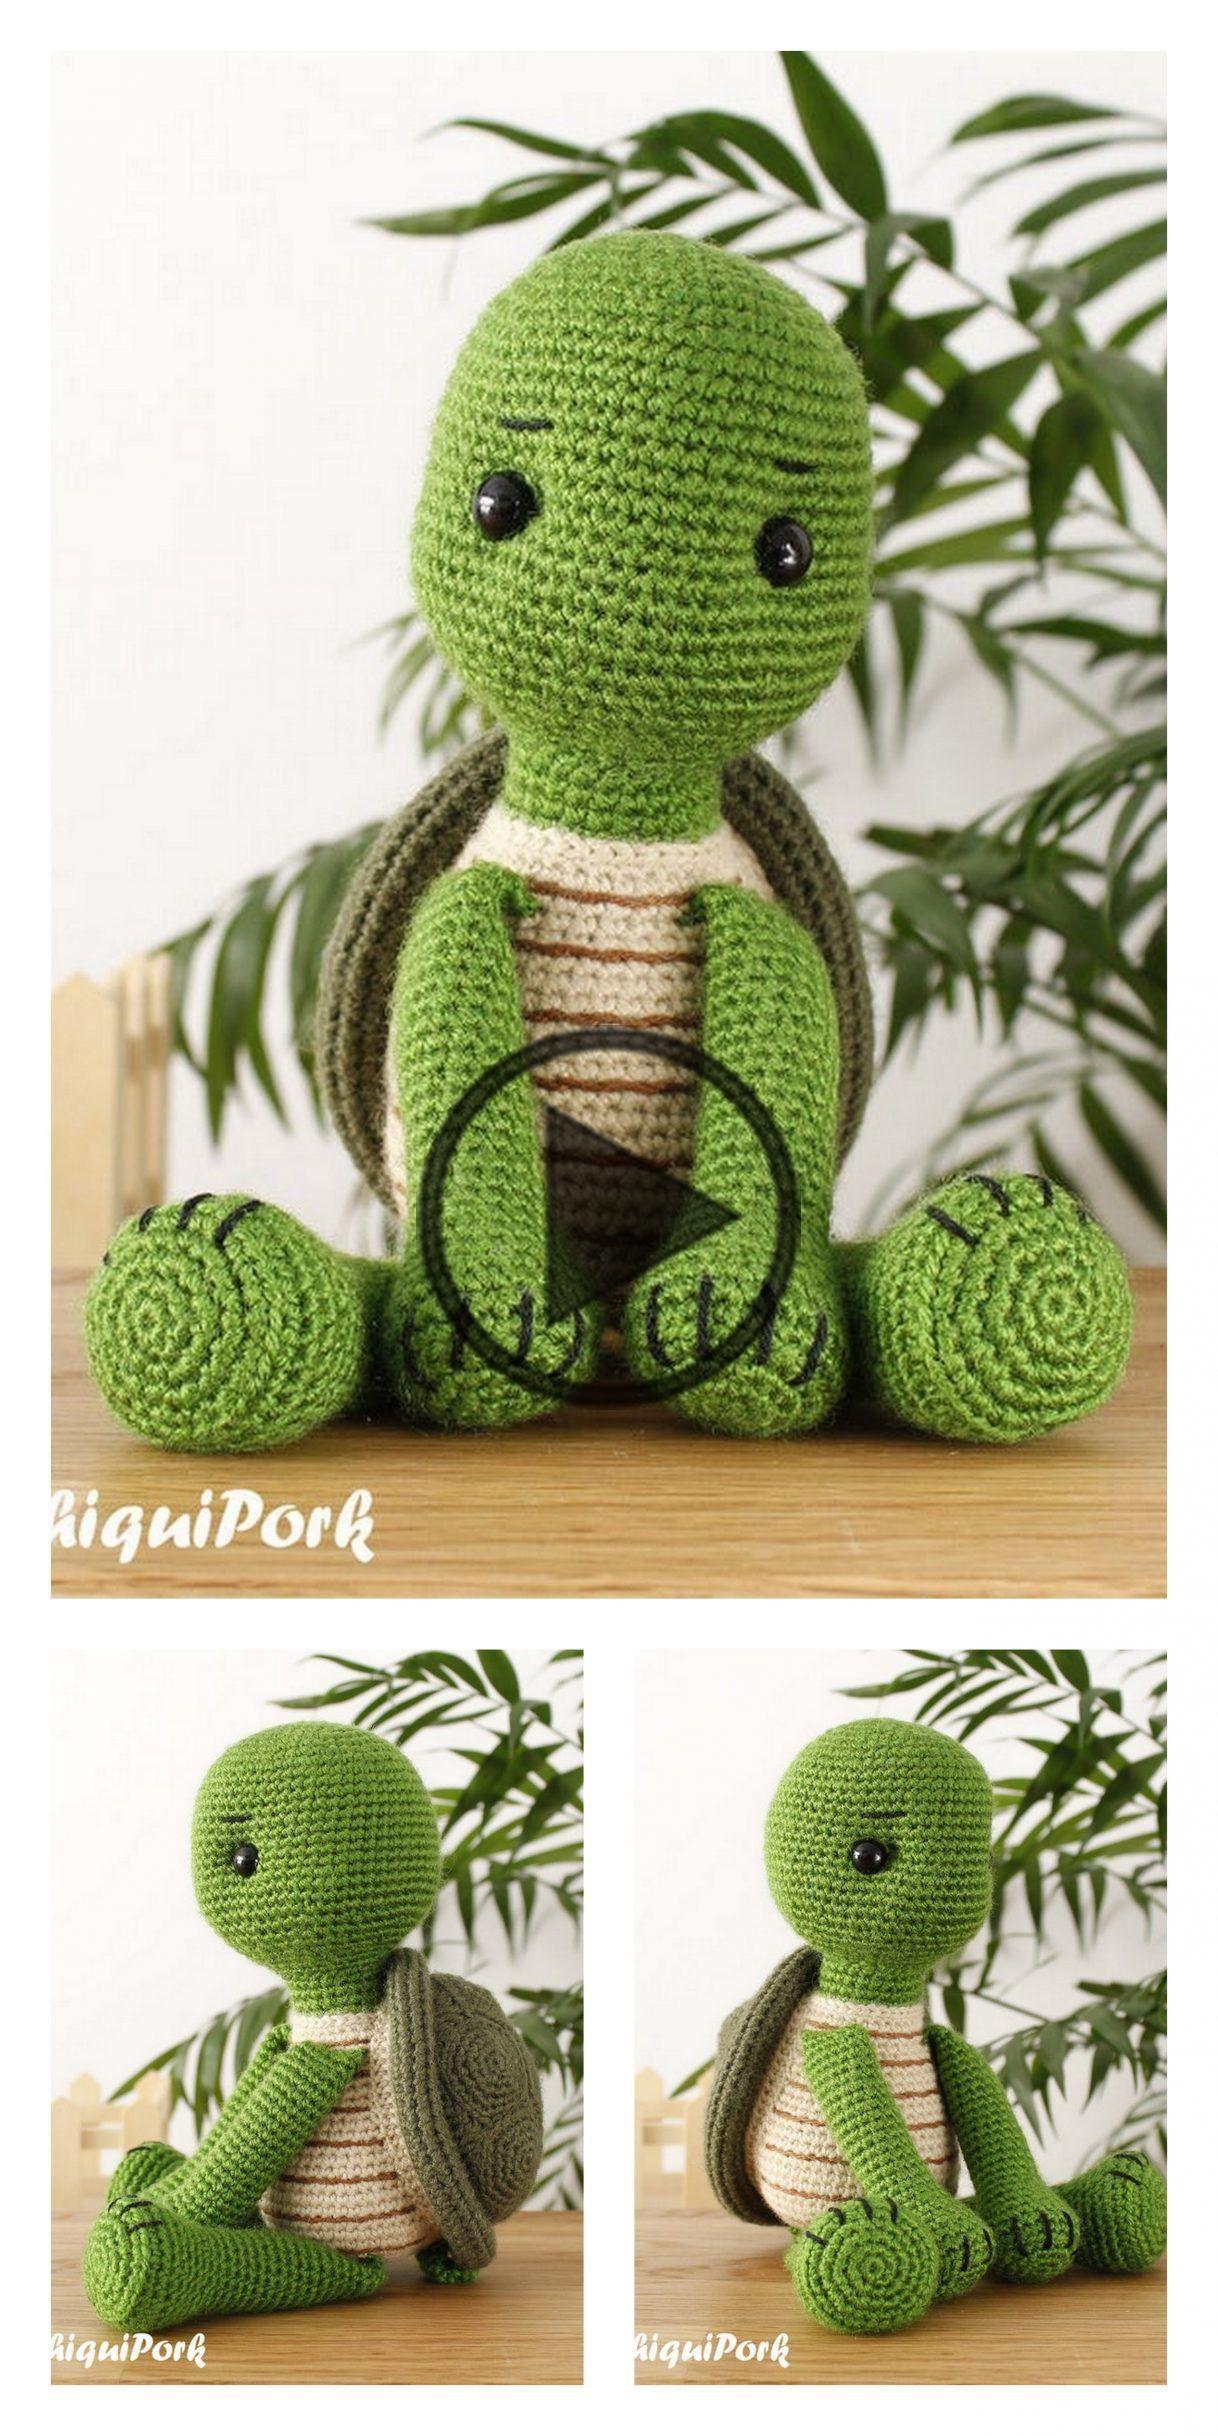 Our Favorite Pinterest Crochet Patterns | Crochet snail, Crochet ... | 2436x1218